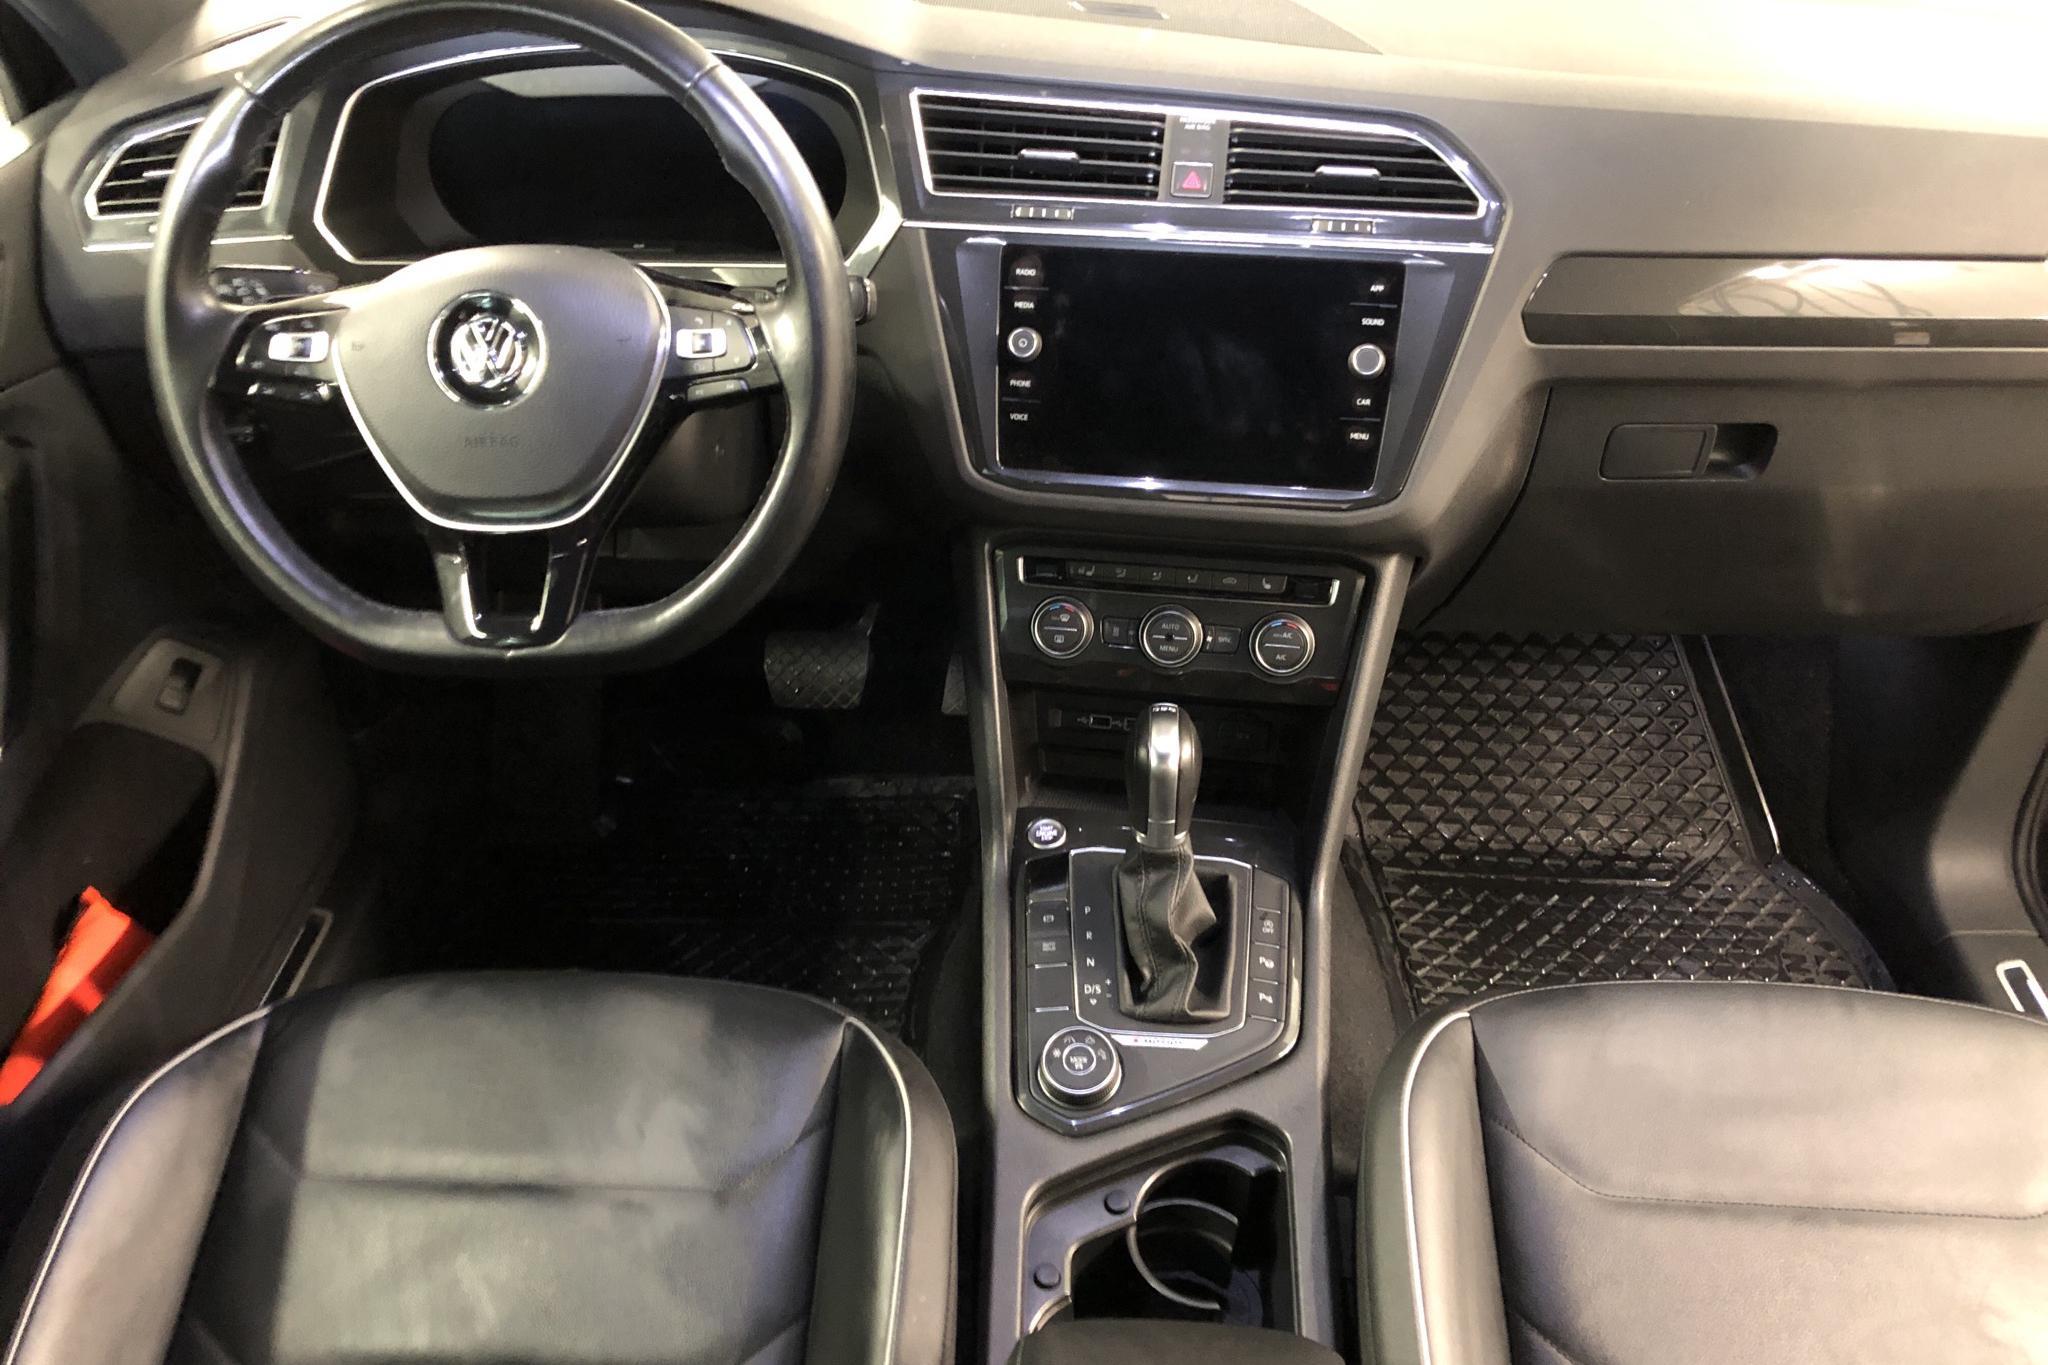 VW Tiguan 2.0 TDI 4MOTION (190hk) - 6 668 mil - Automat - svart - 2018